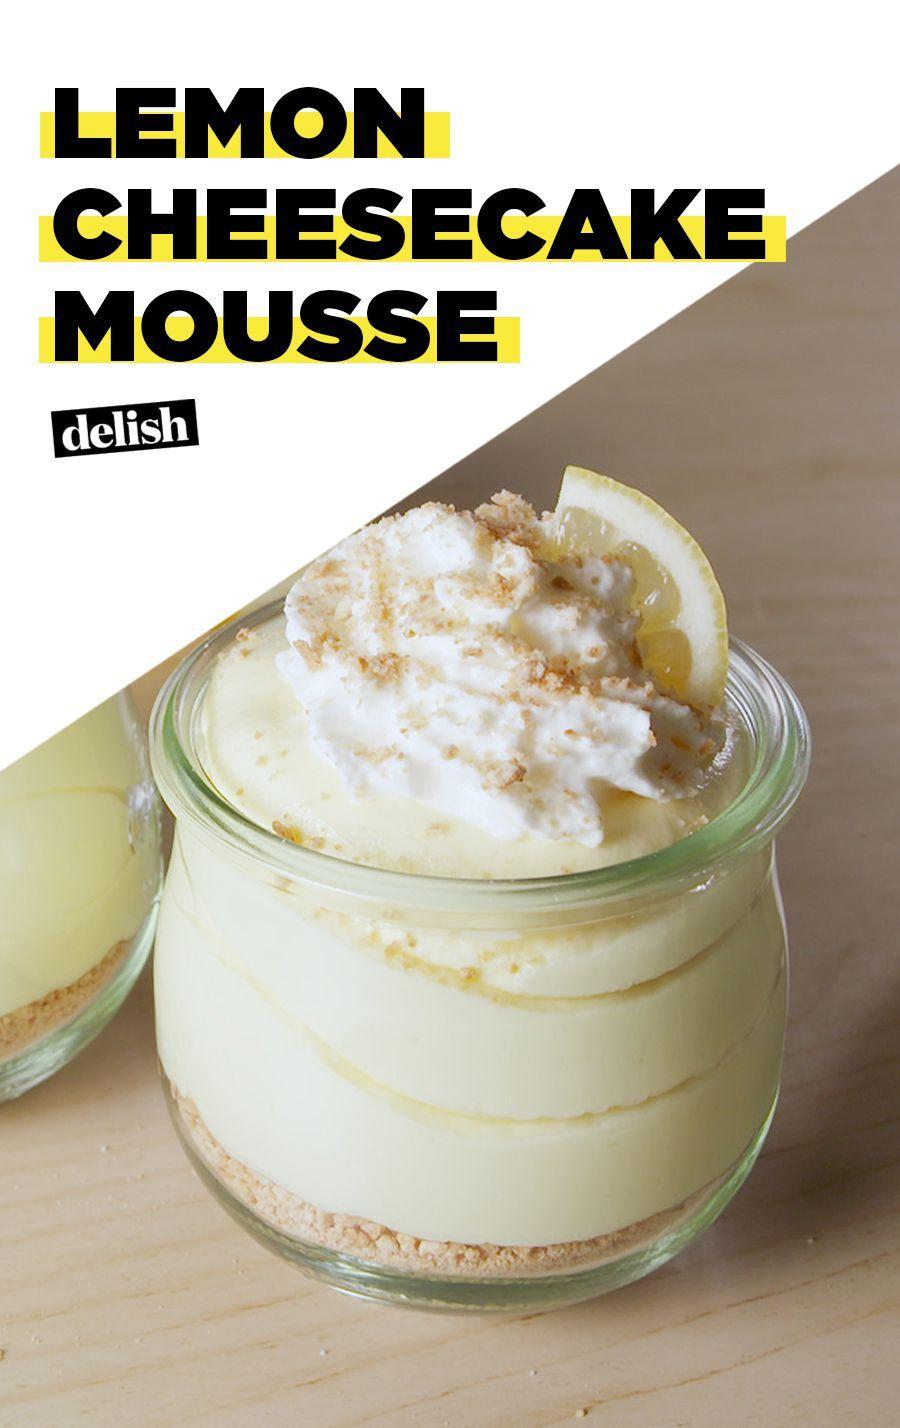 lemon cheesecake mousse recipe lemon mousse dessert. Black Bedroom Furniture Sets. Home Design Ideas